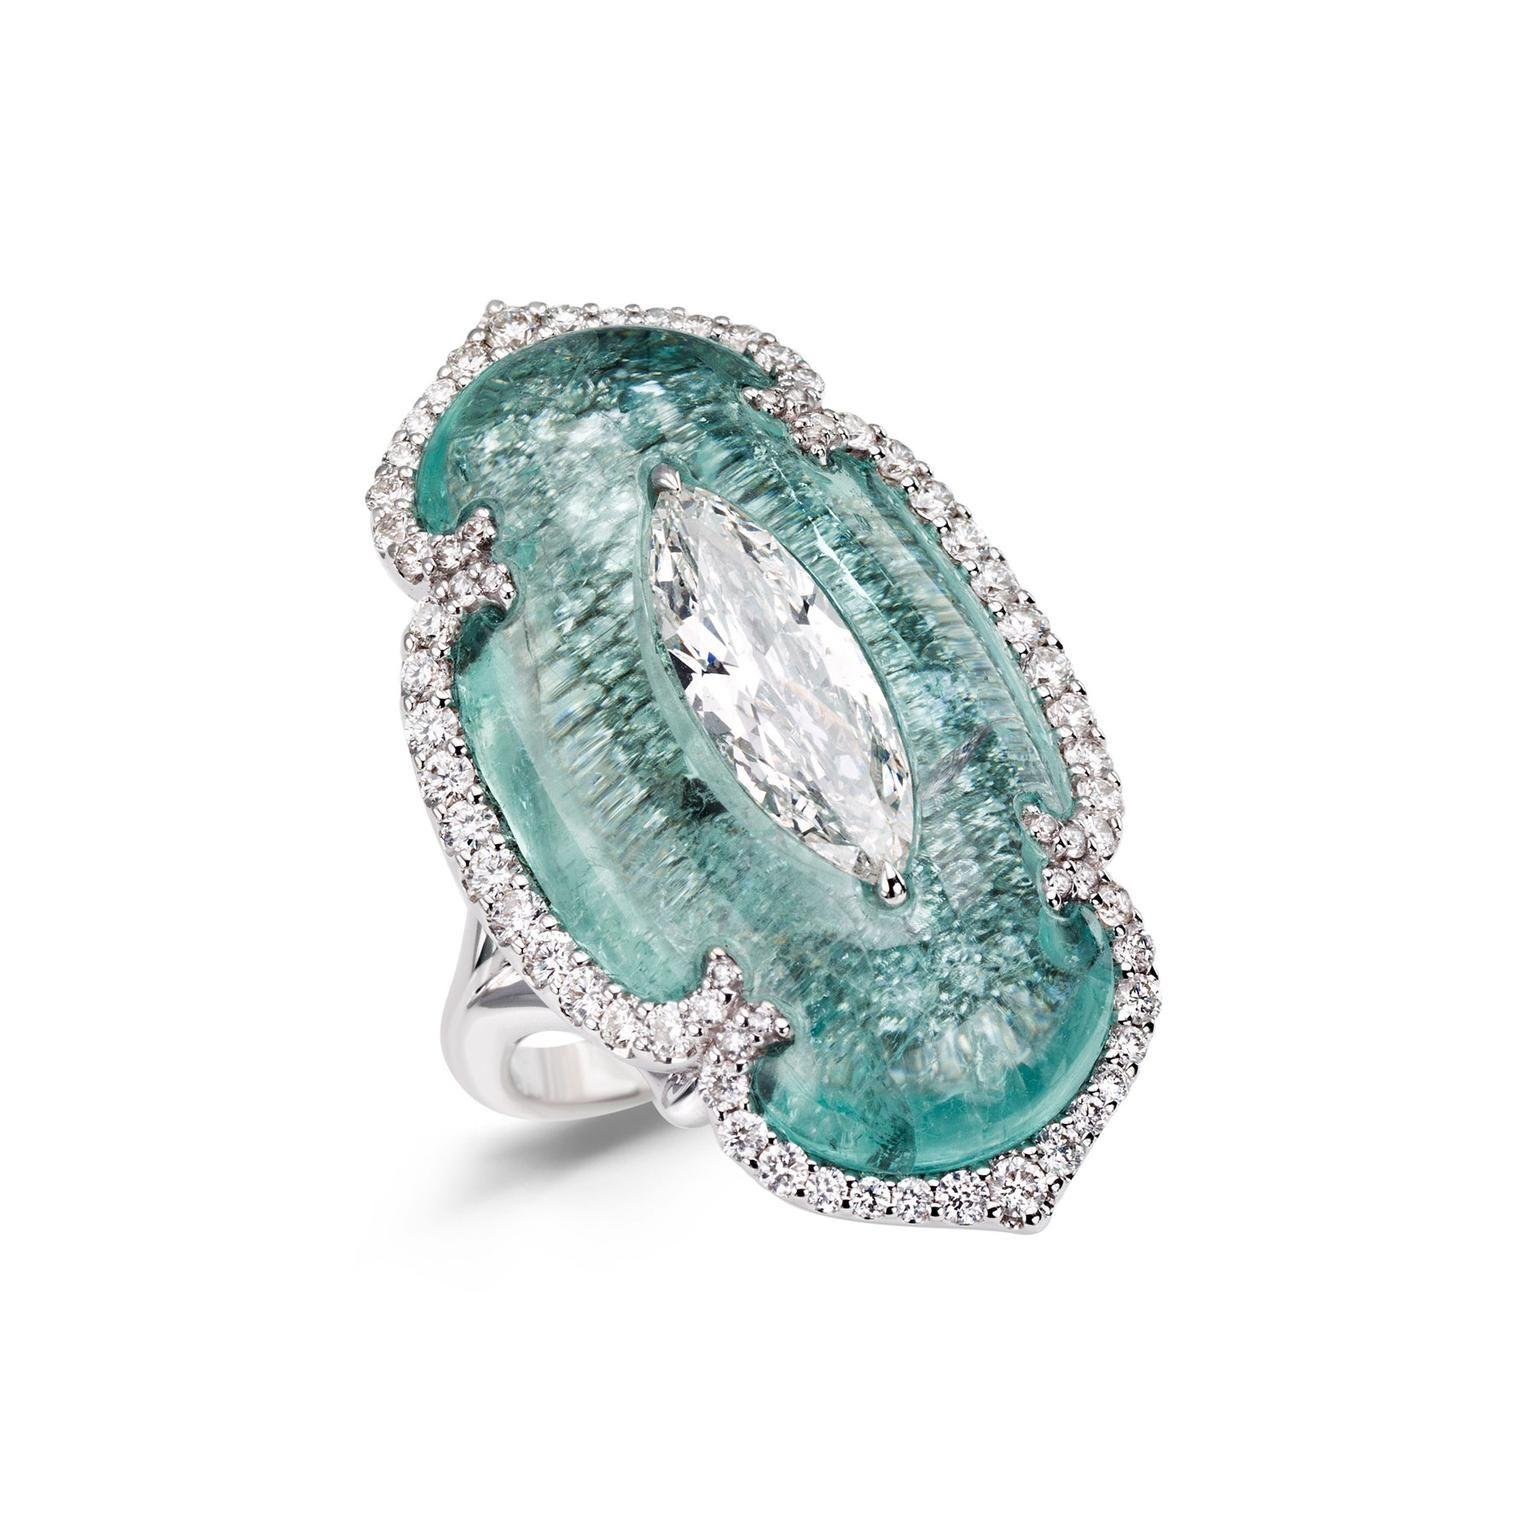 Boghossian Art of Inlay Paraiba tourmaline and diamond high jewellery ring. http://www.thejewelleryeditor.com/jewellery/article/boghossians-daring-creations-are-perfect-reason-visit-masterpiece/ #jewelry